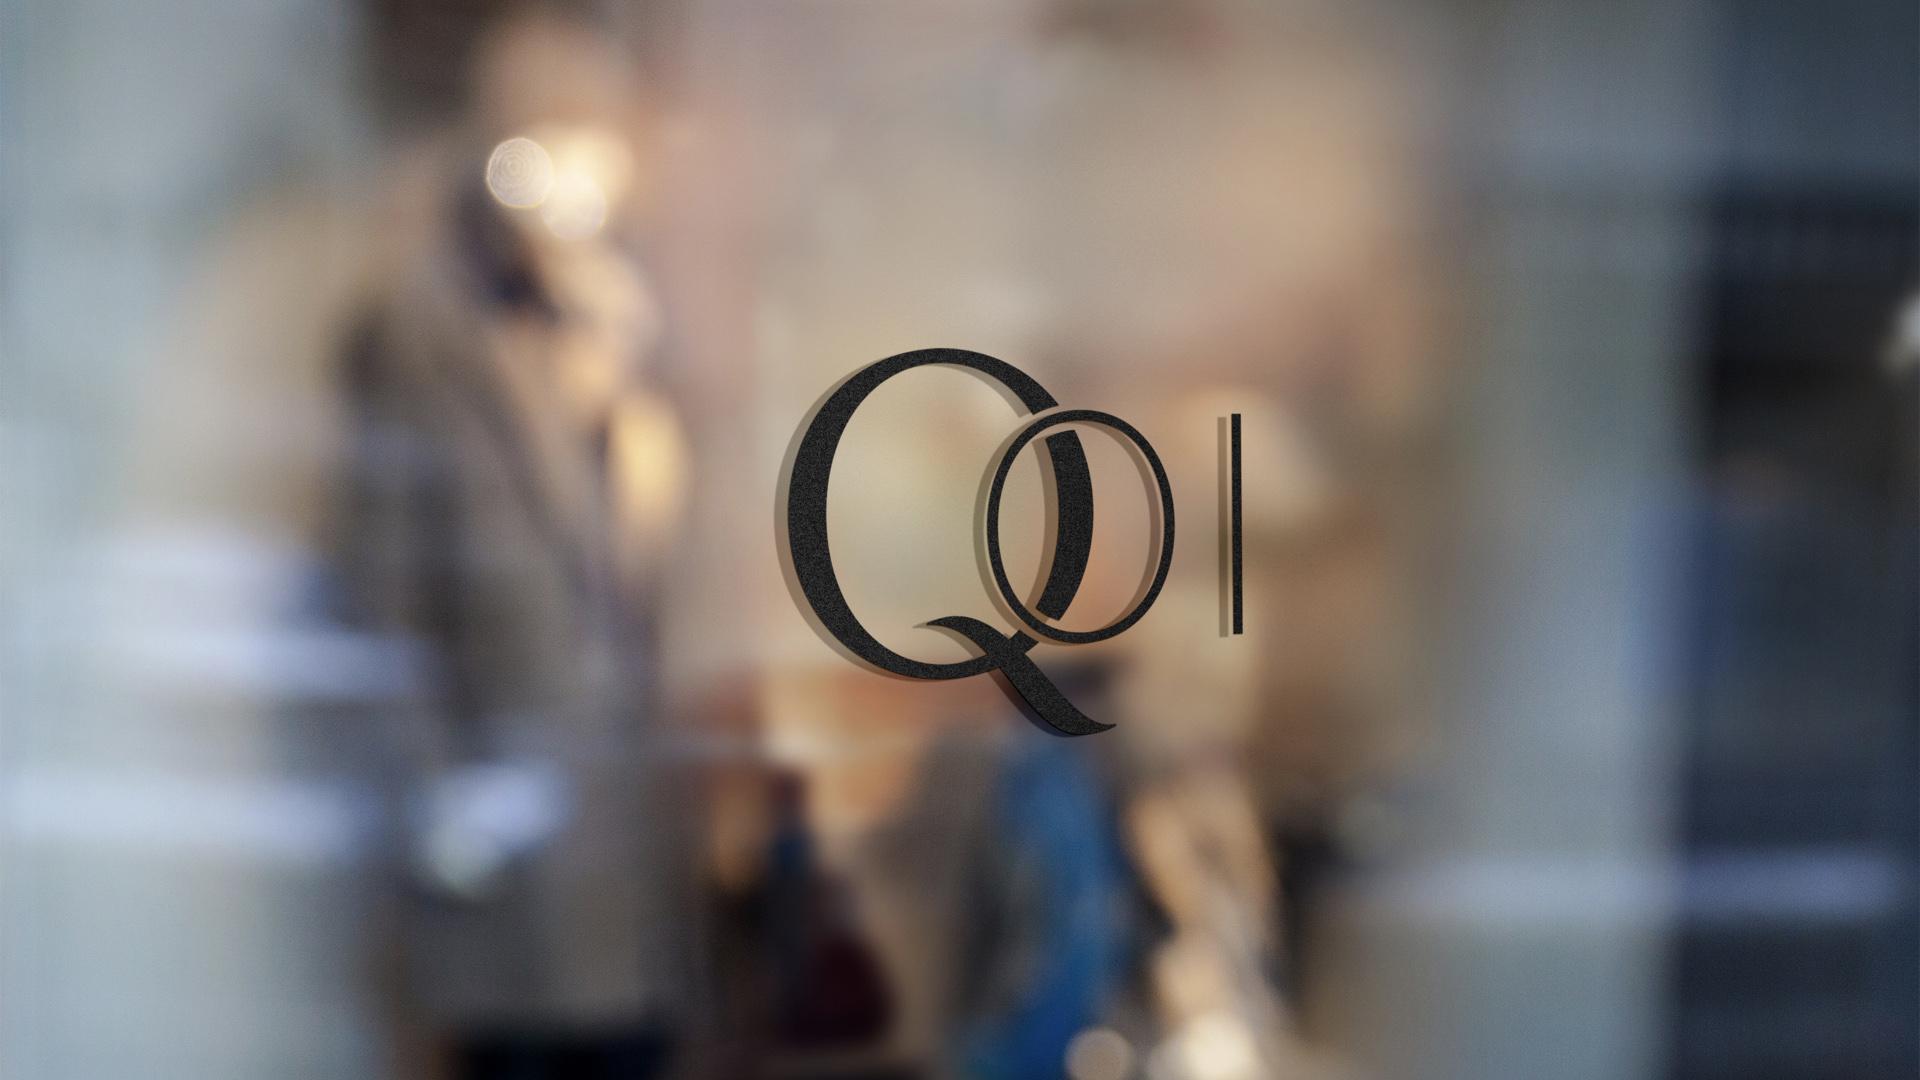 Q01.jpeg.011.jpg